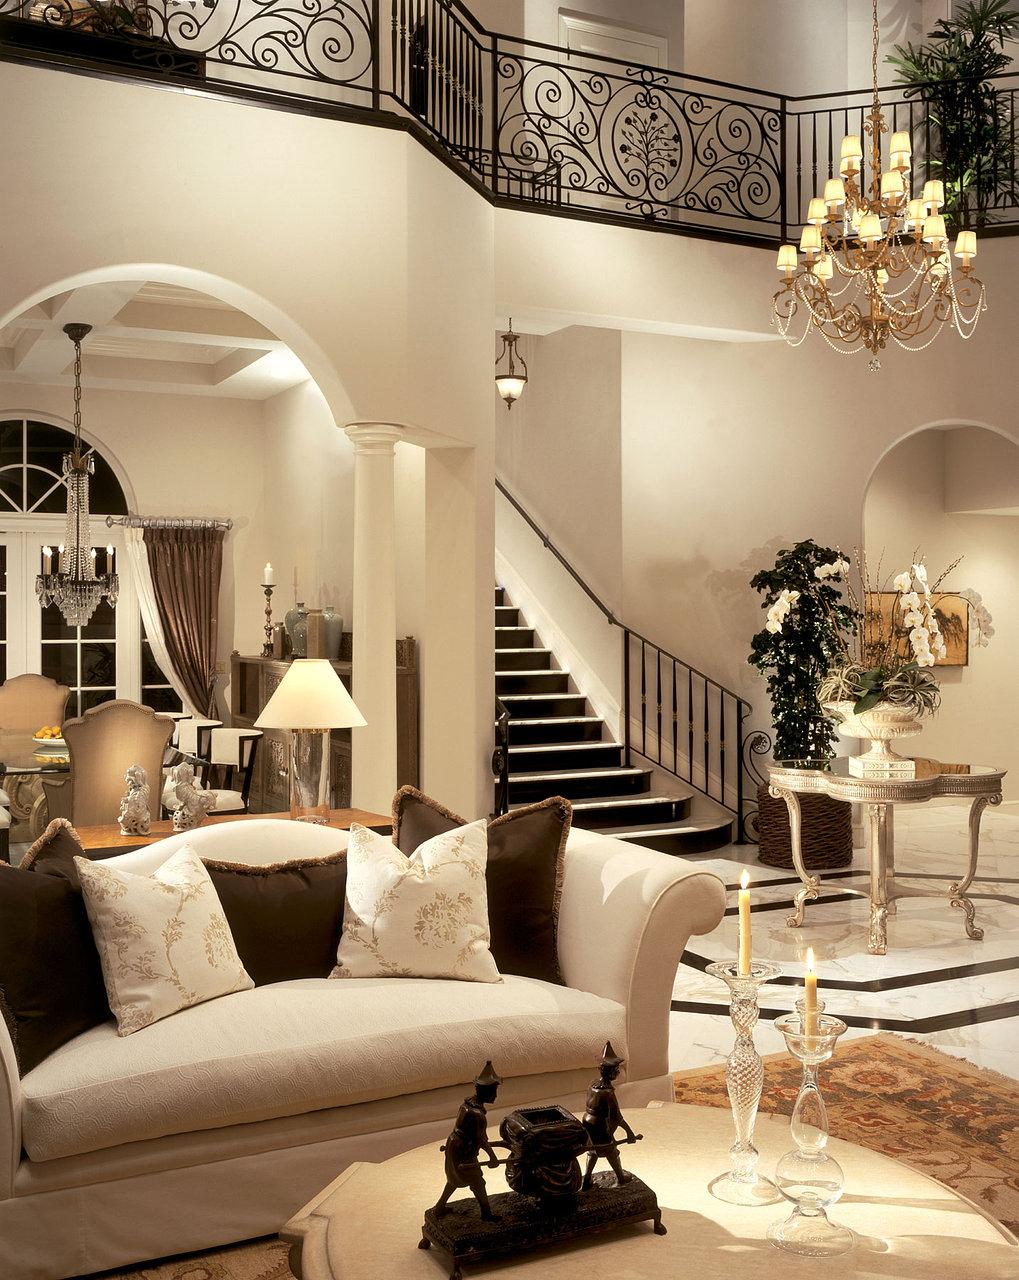 Luxury Living Room Design Pictures